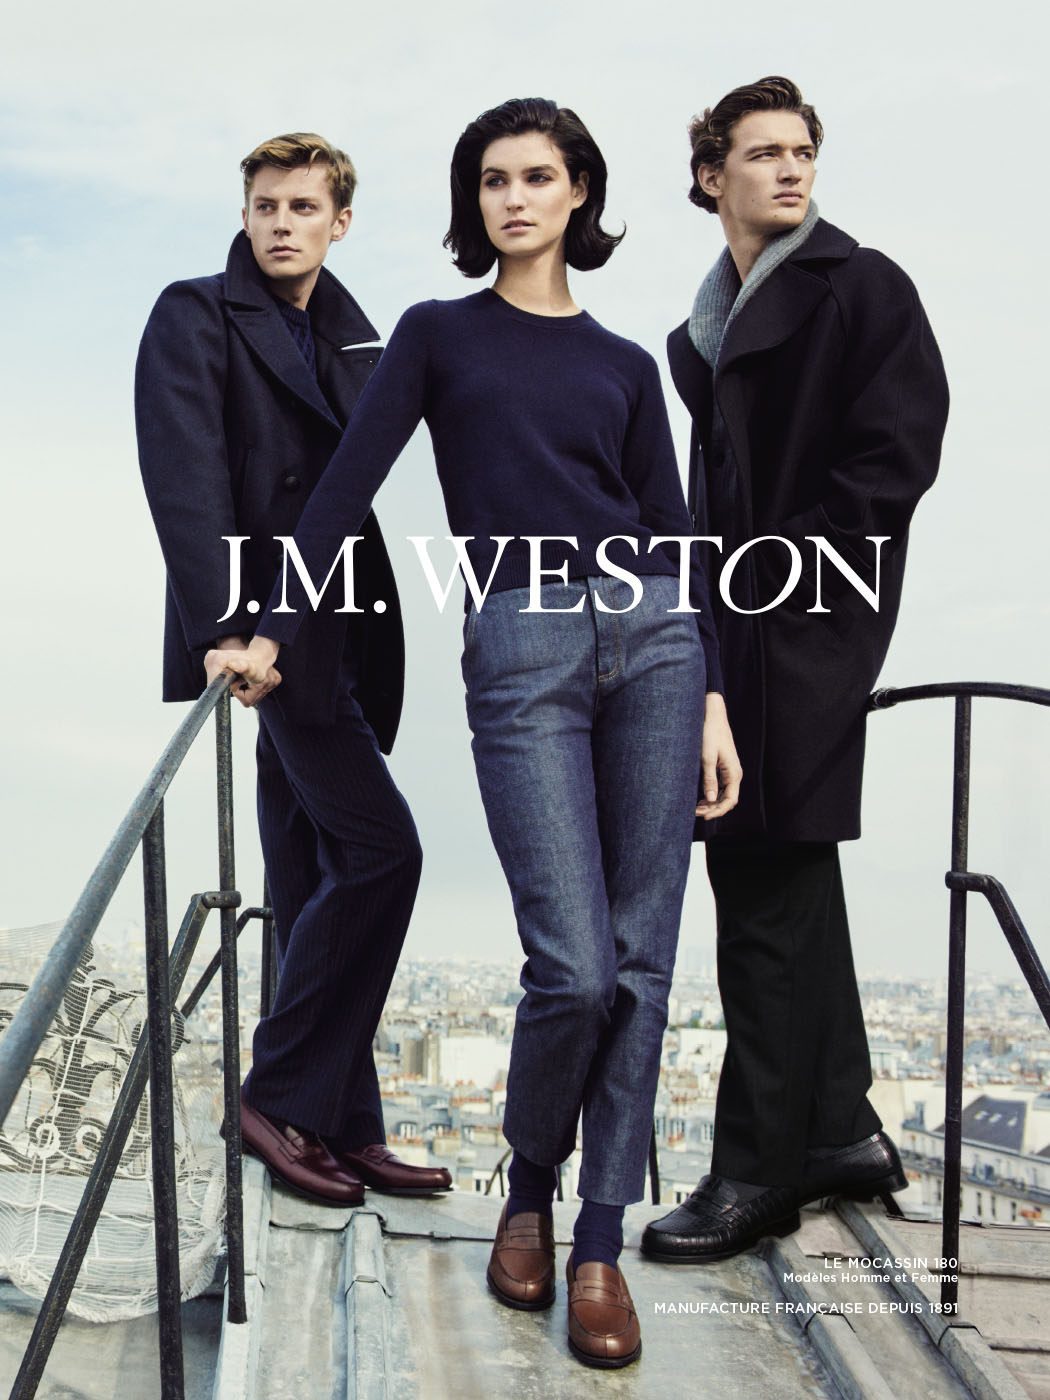 J.M. WESTON Le Moc' 2016. Mocassin Manufacture française Made in France Campagne